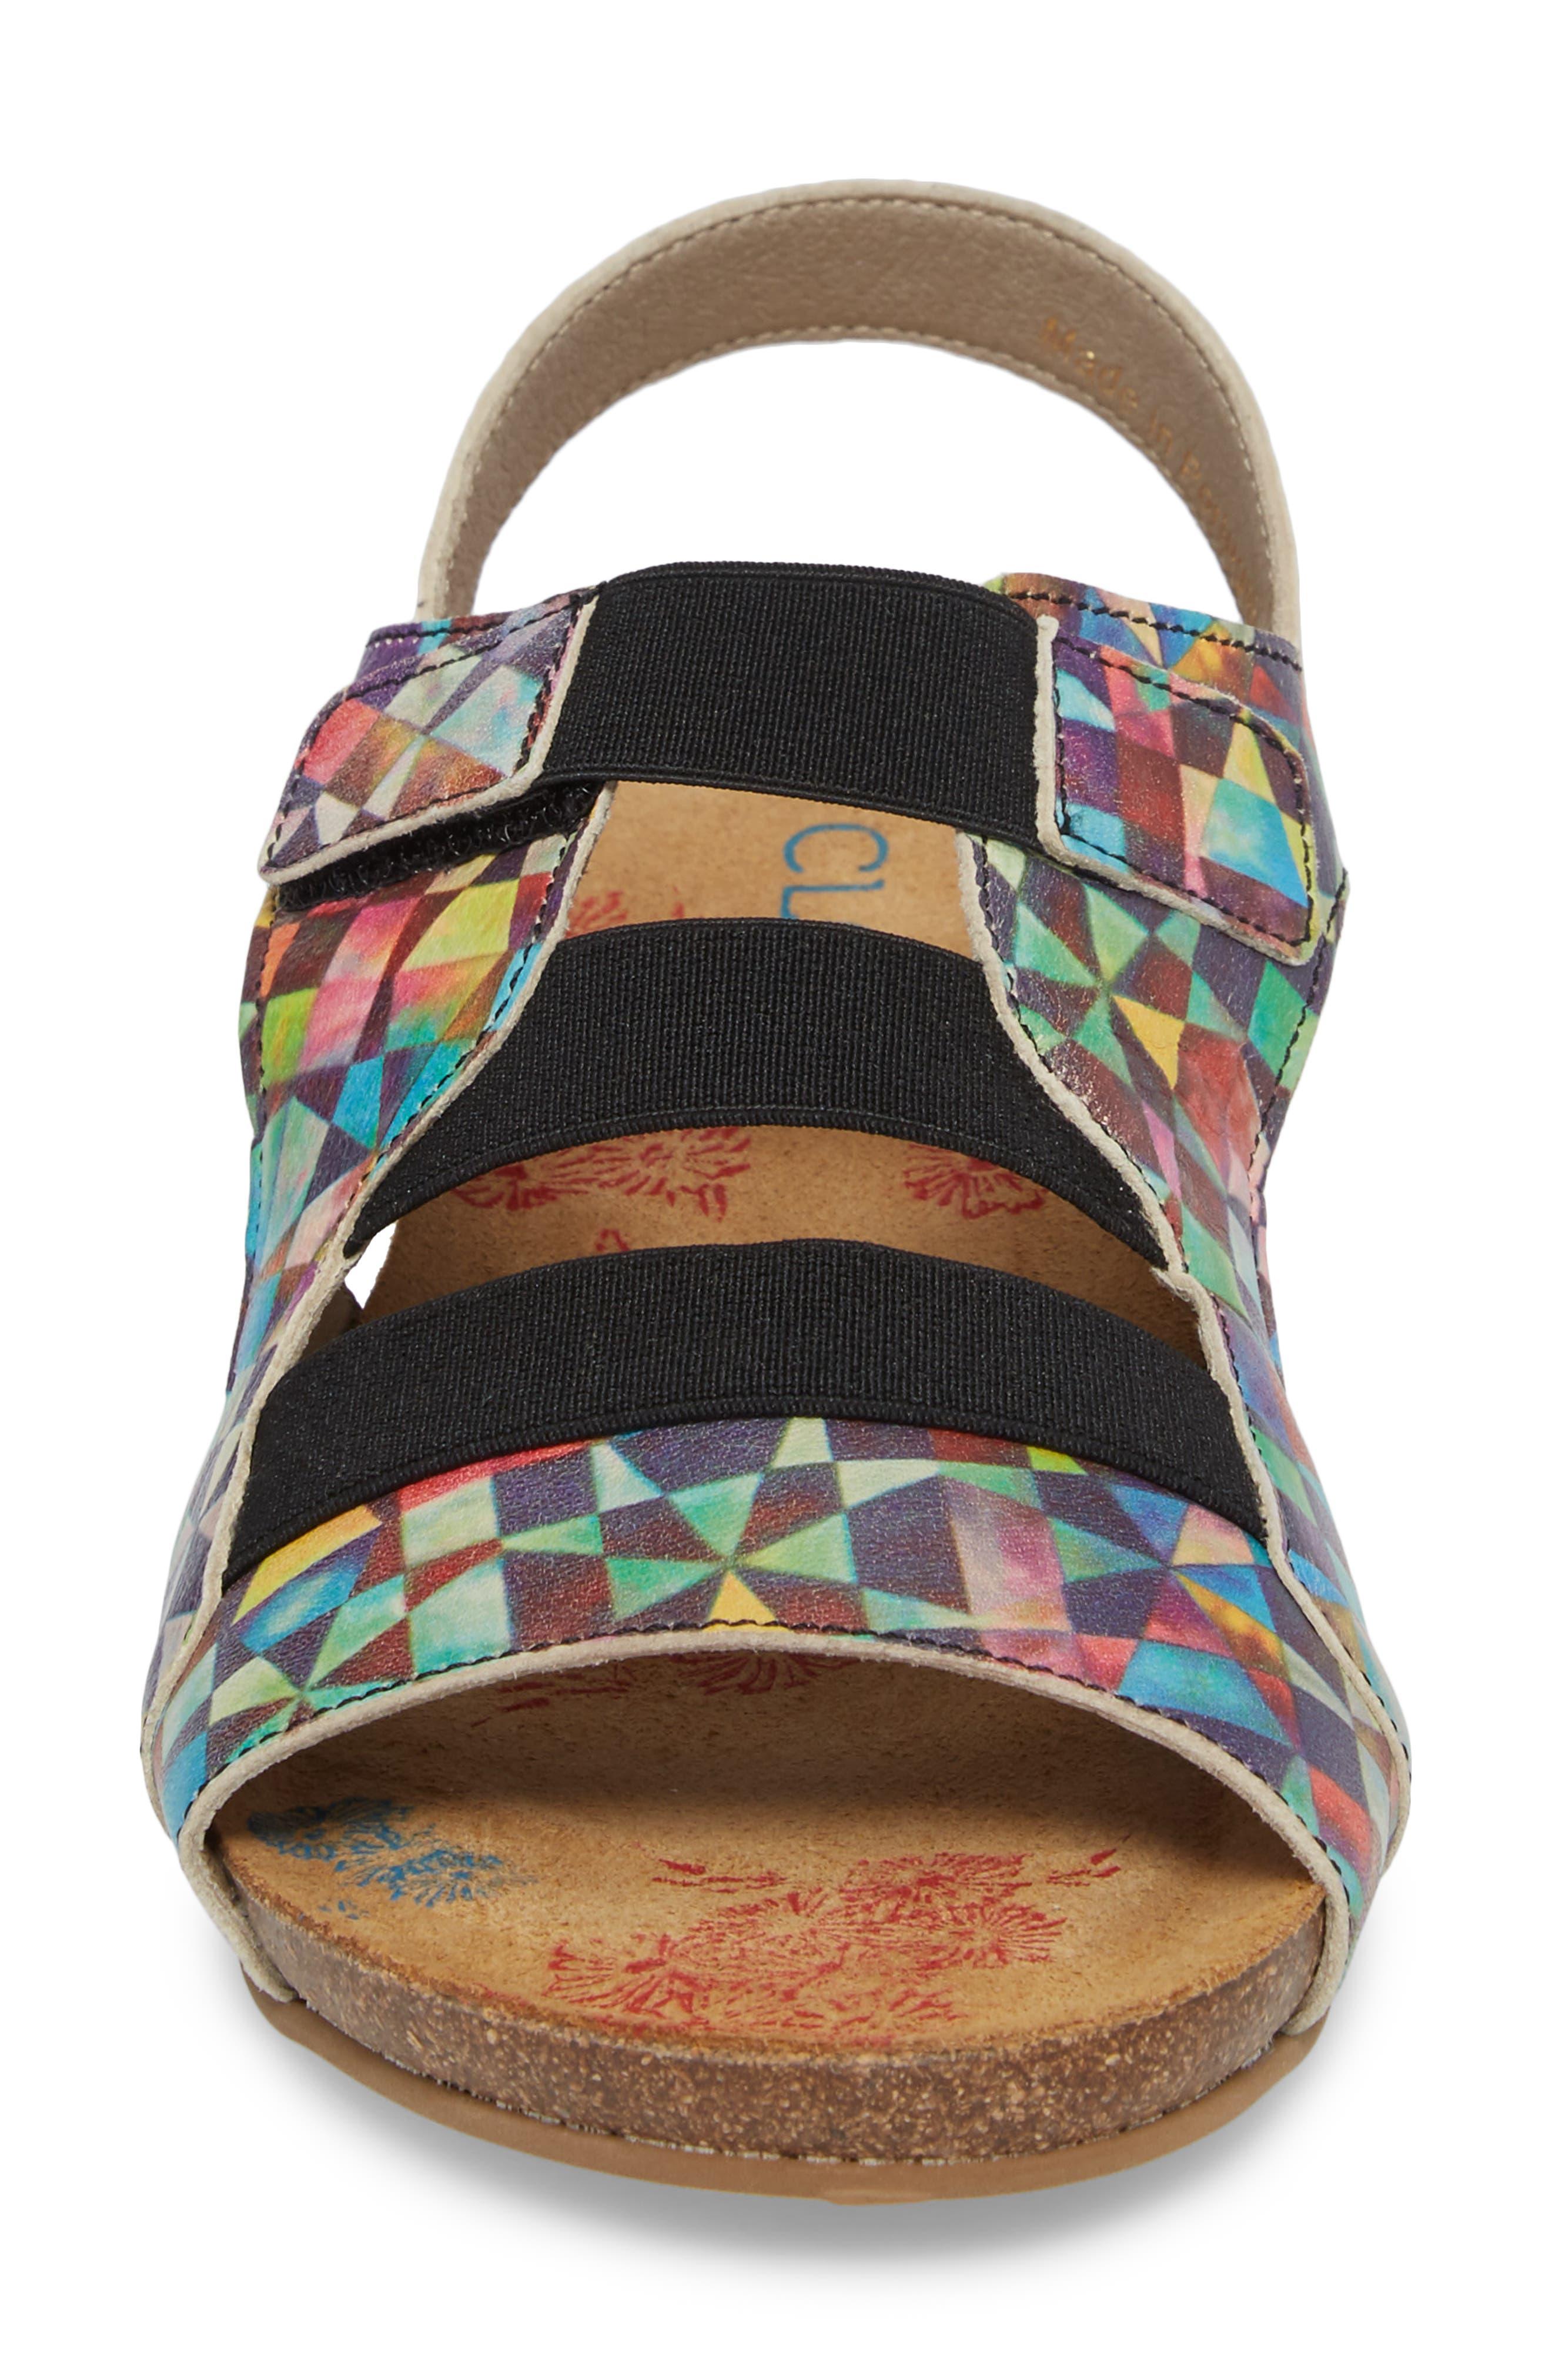 Duffy Wedge Sandal,                             Alternate thumbnail 4, color,                             Mystere Leather